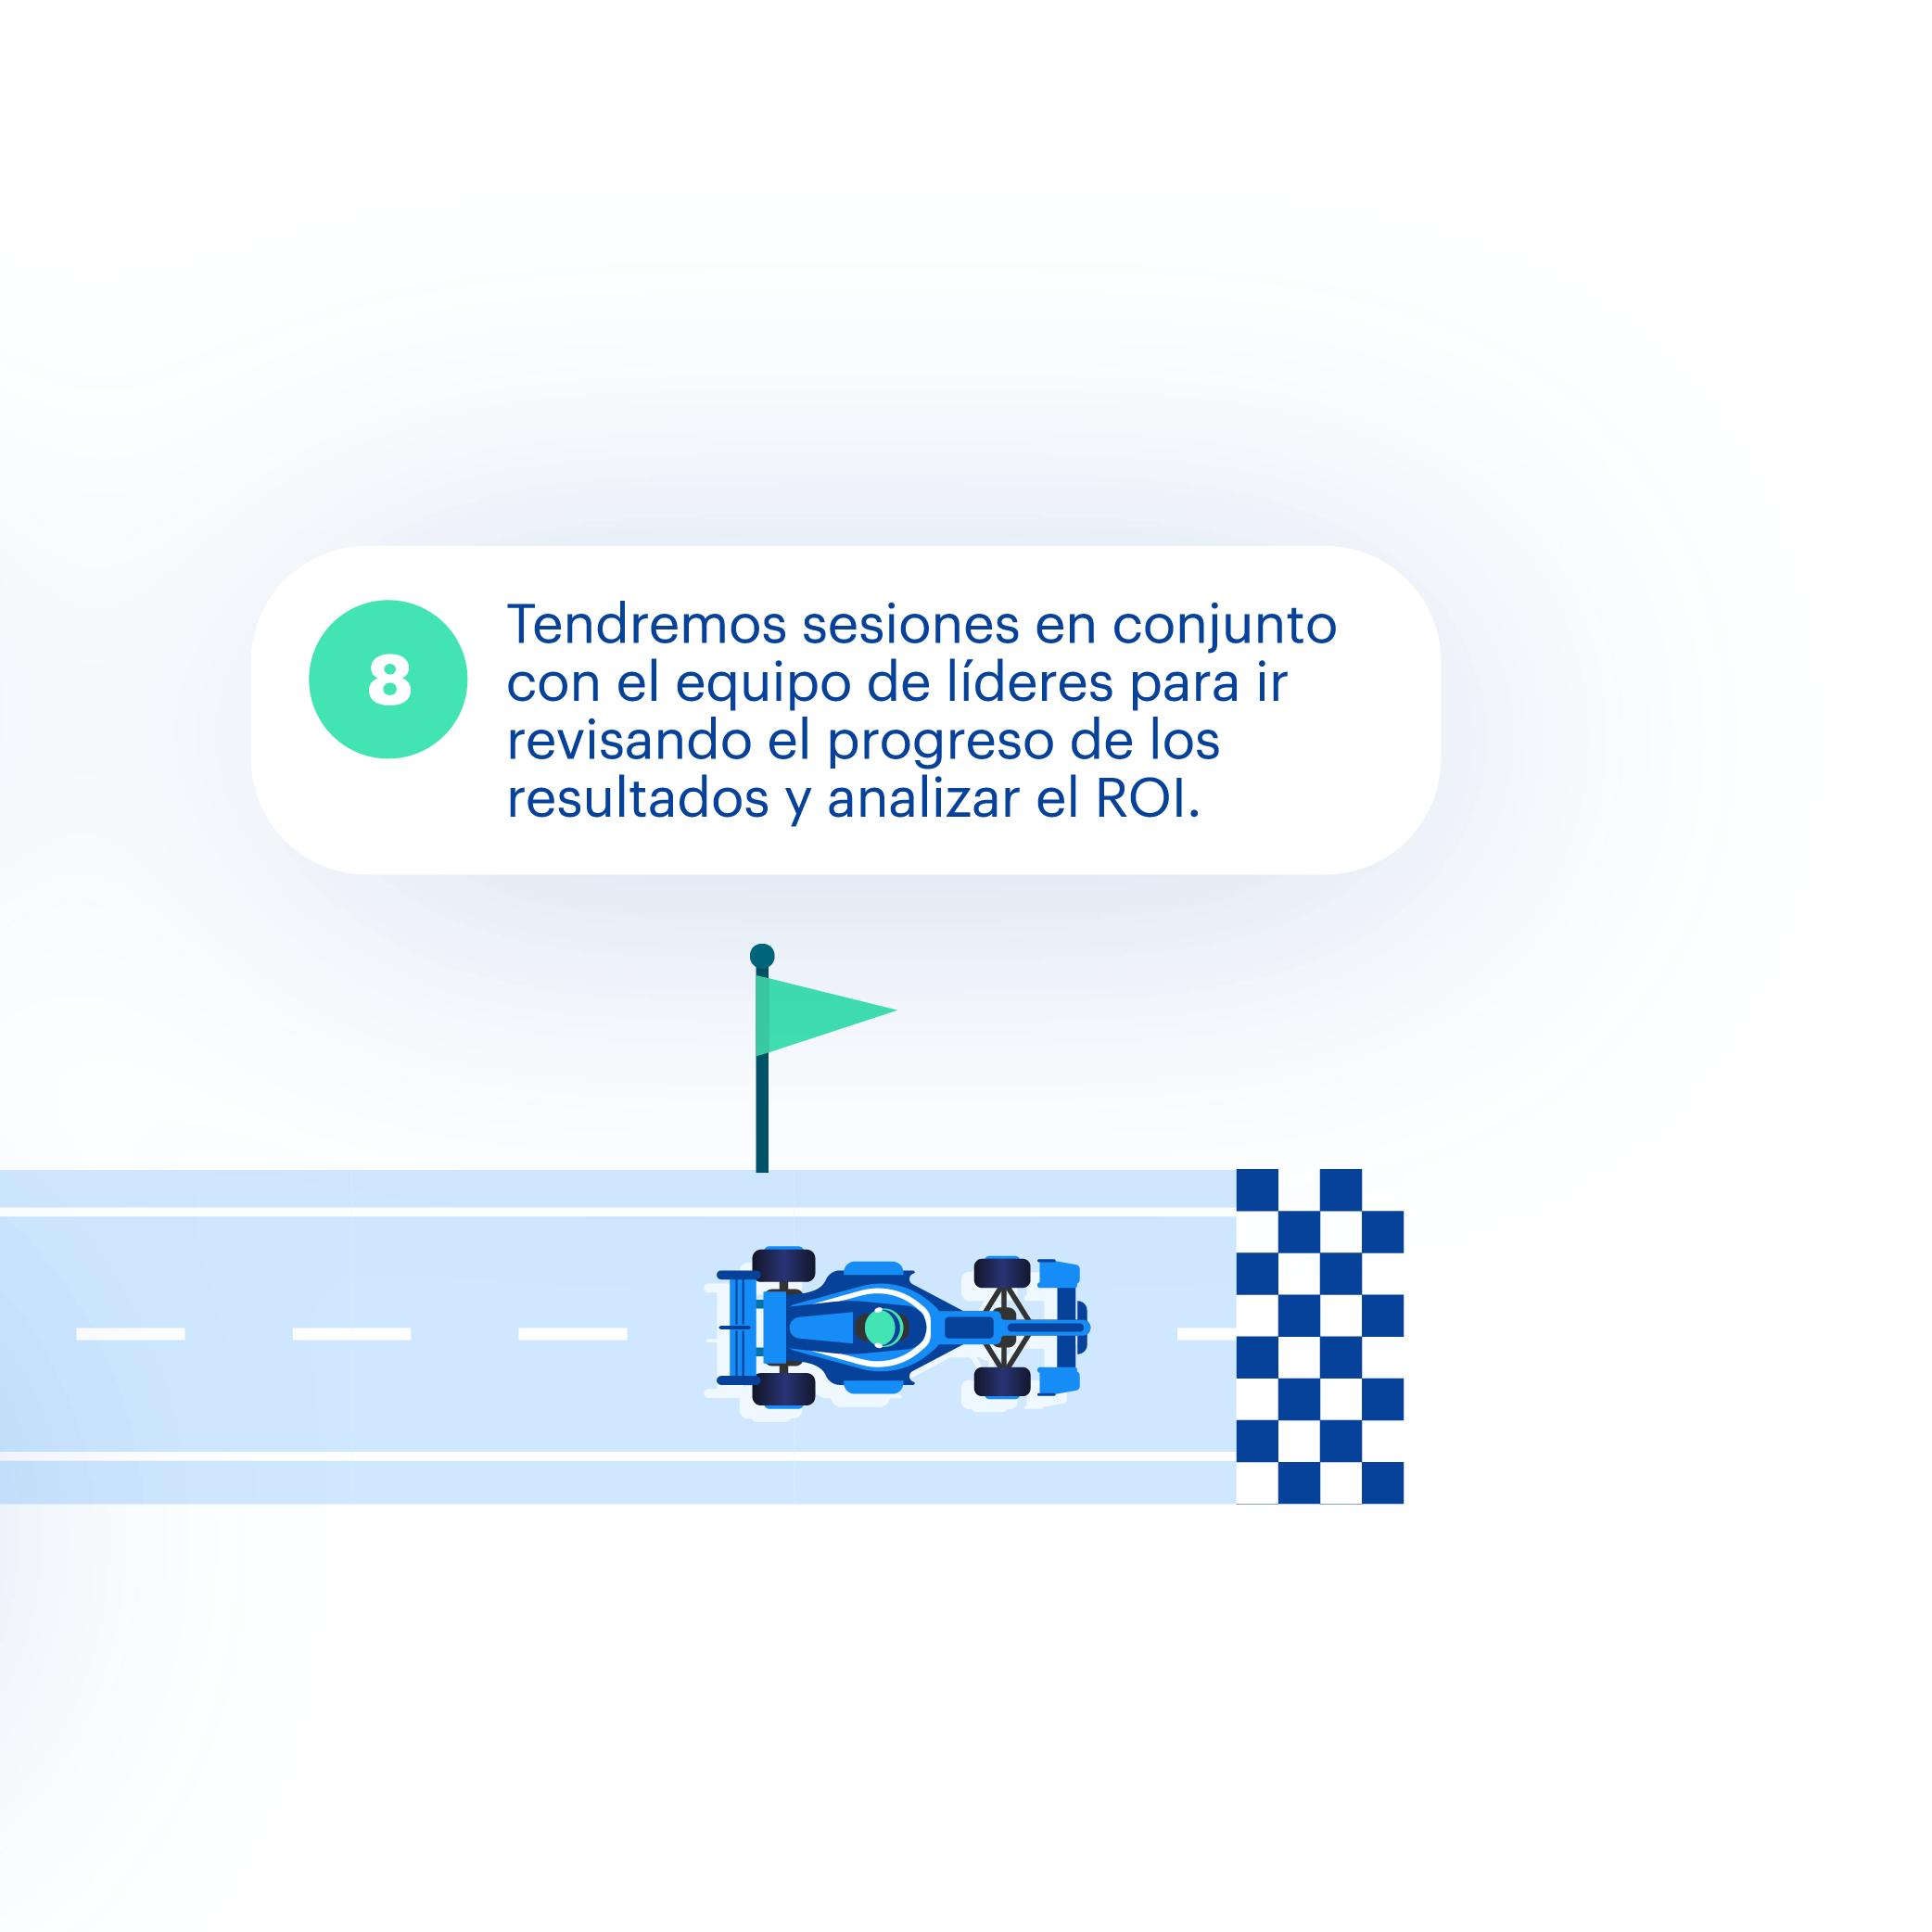 Carretera infografía-04-fine